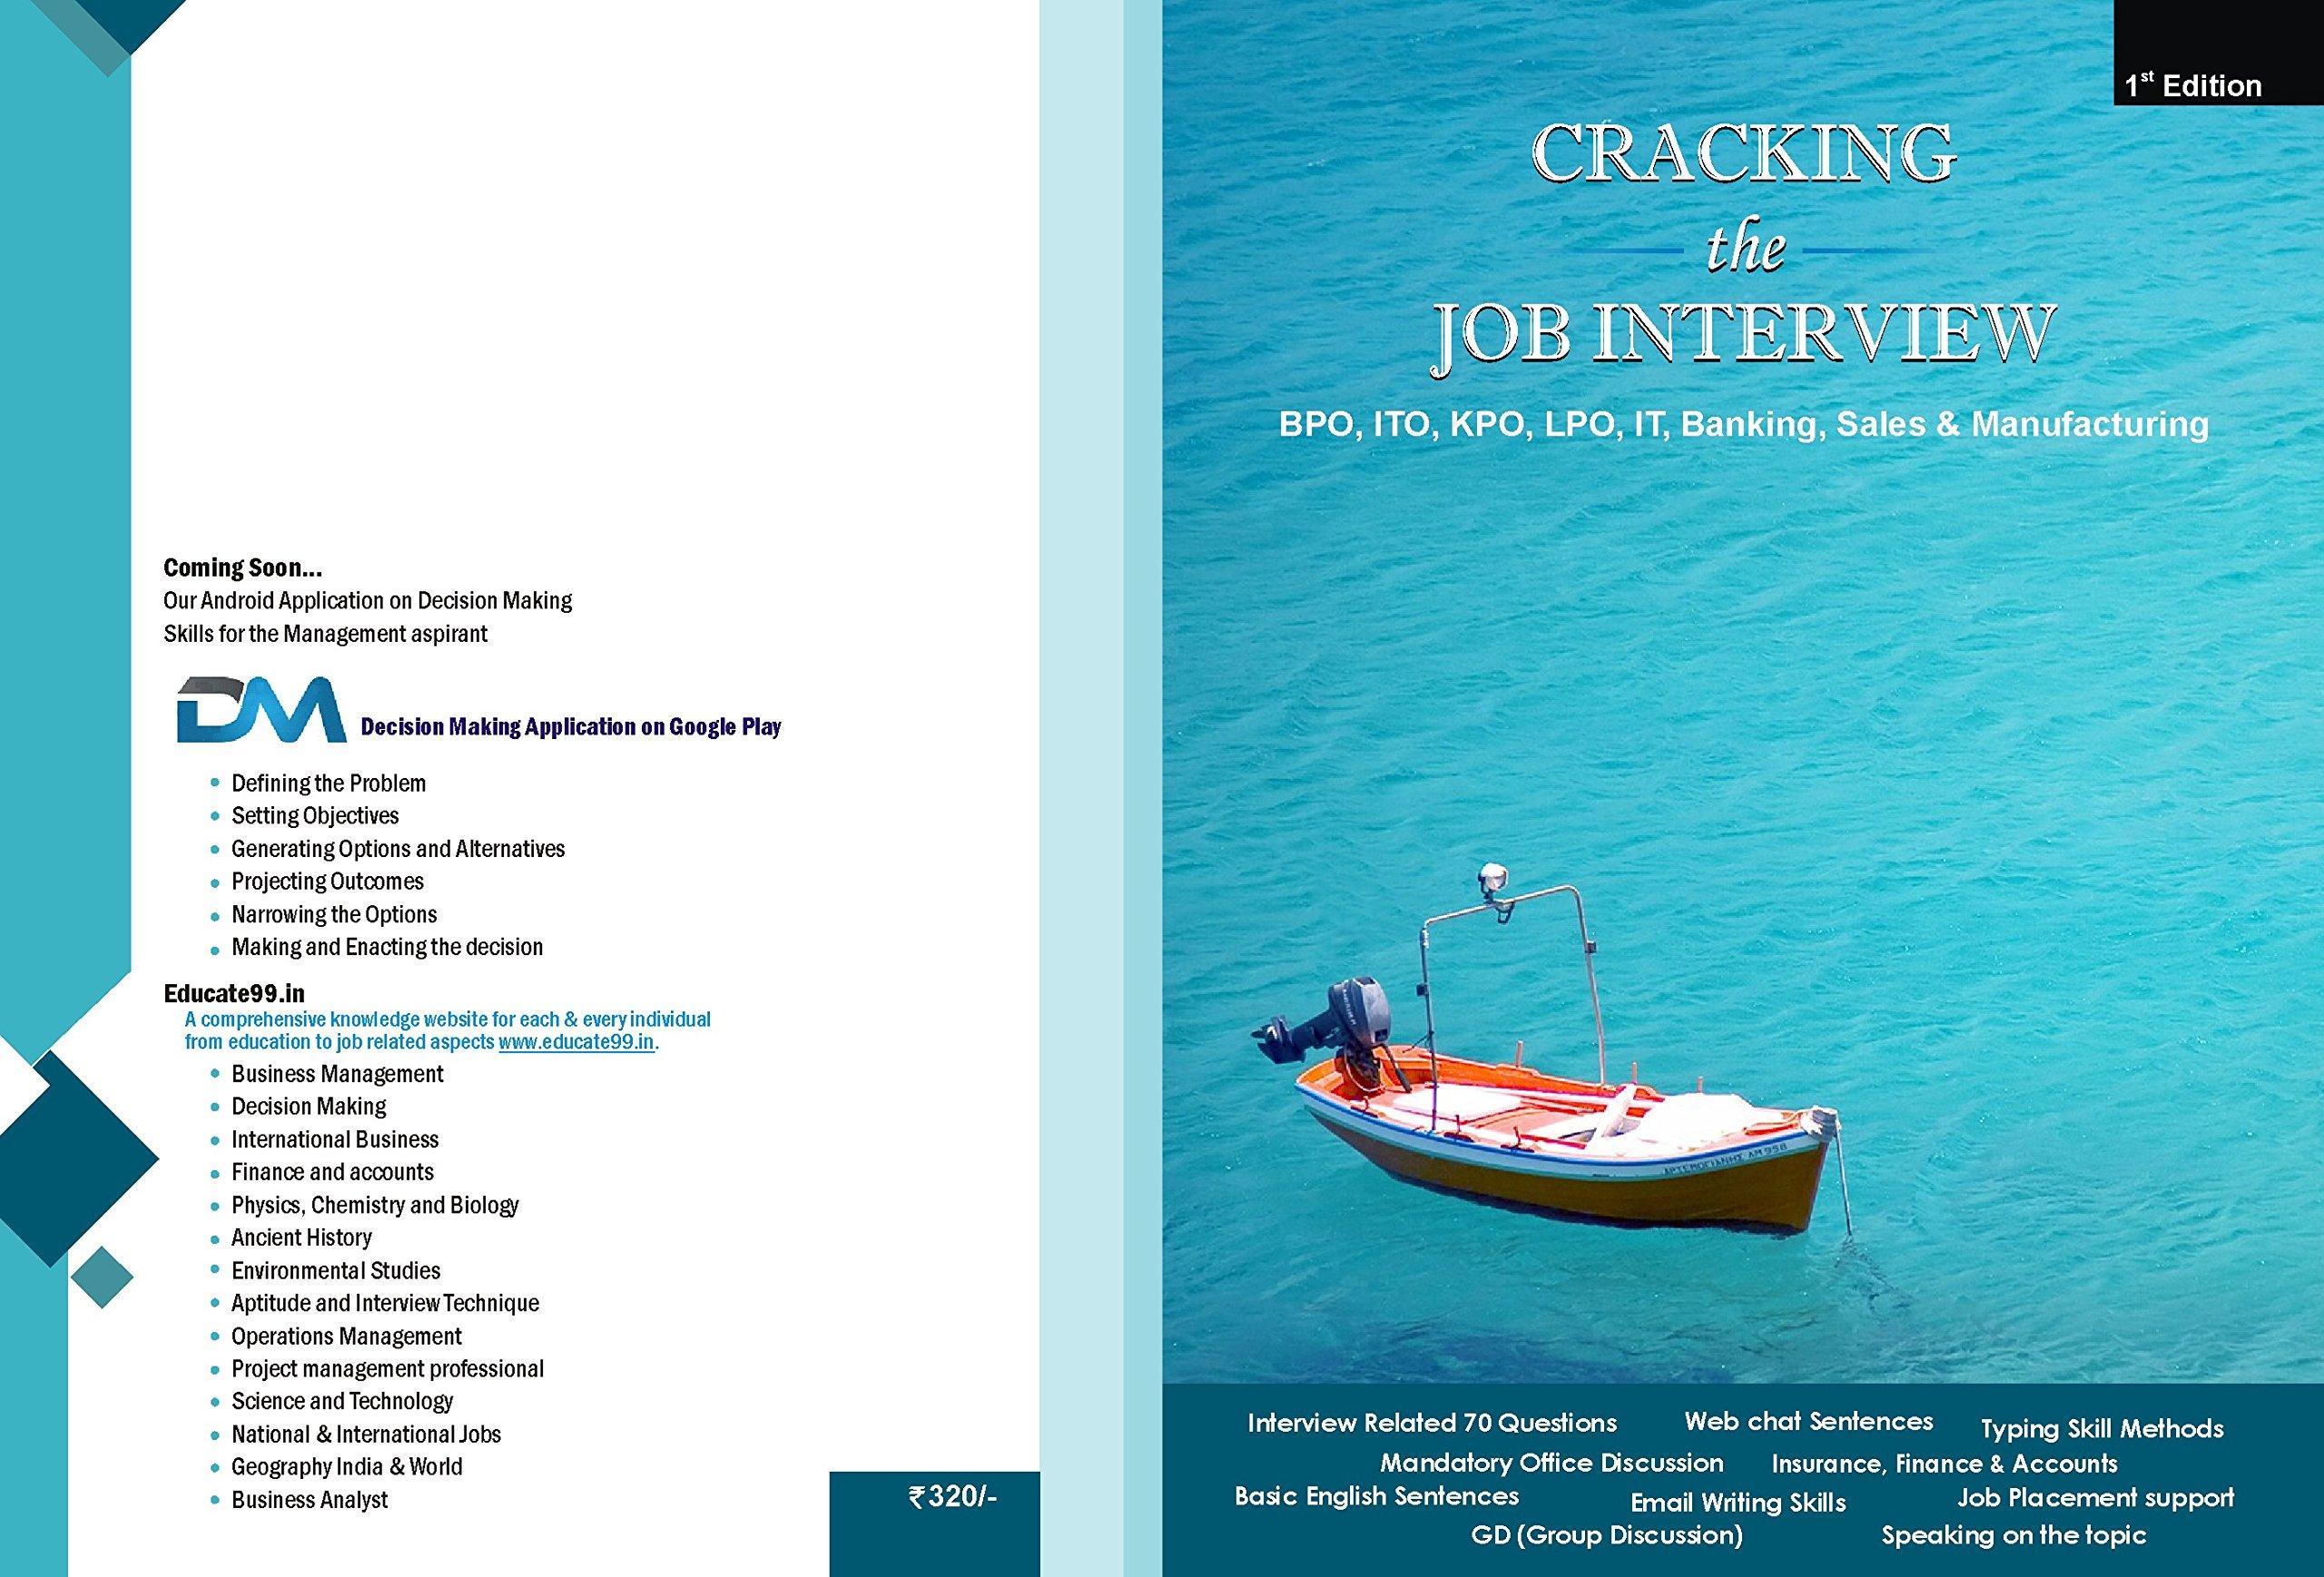 Buy Cracking the Job Interview (BPO, KPO, LPO, ITO, IT